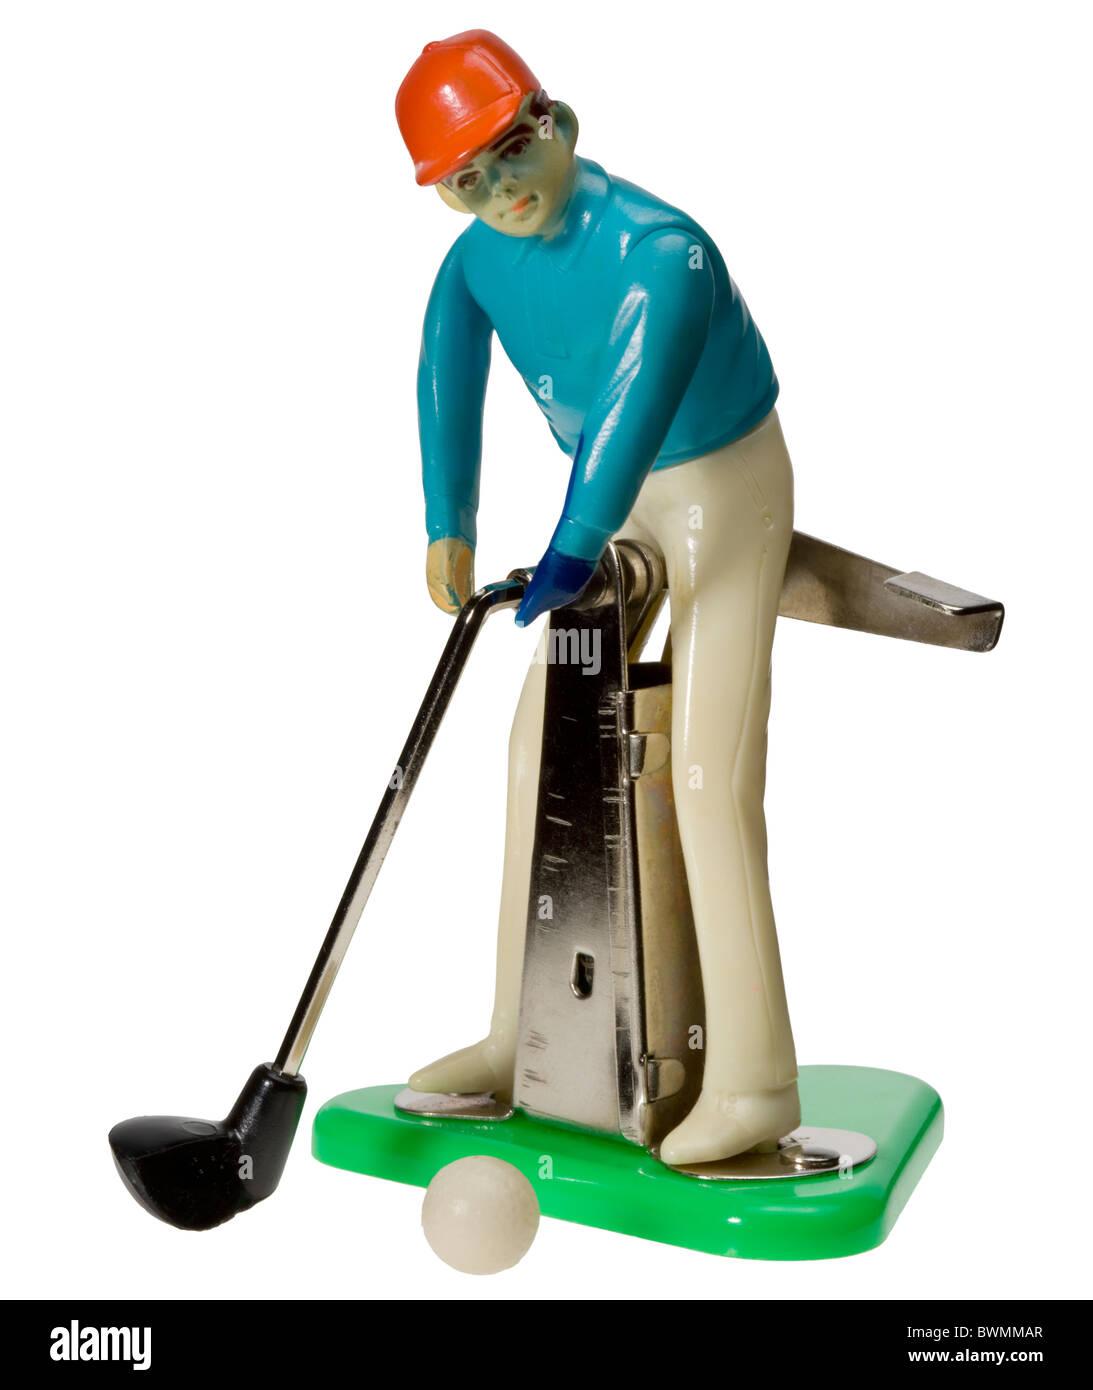 Carpet Golf child's game Stock Photo